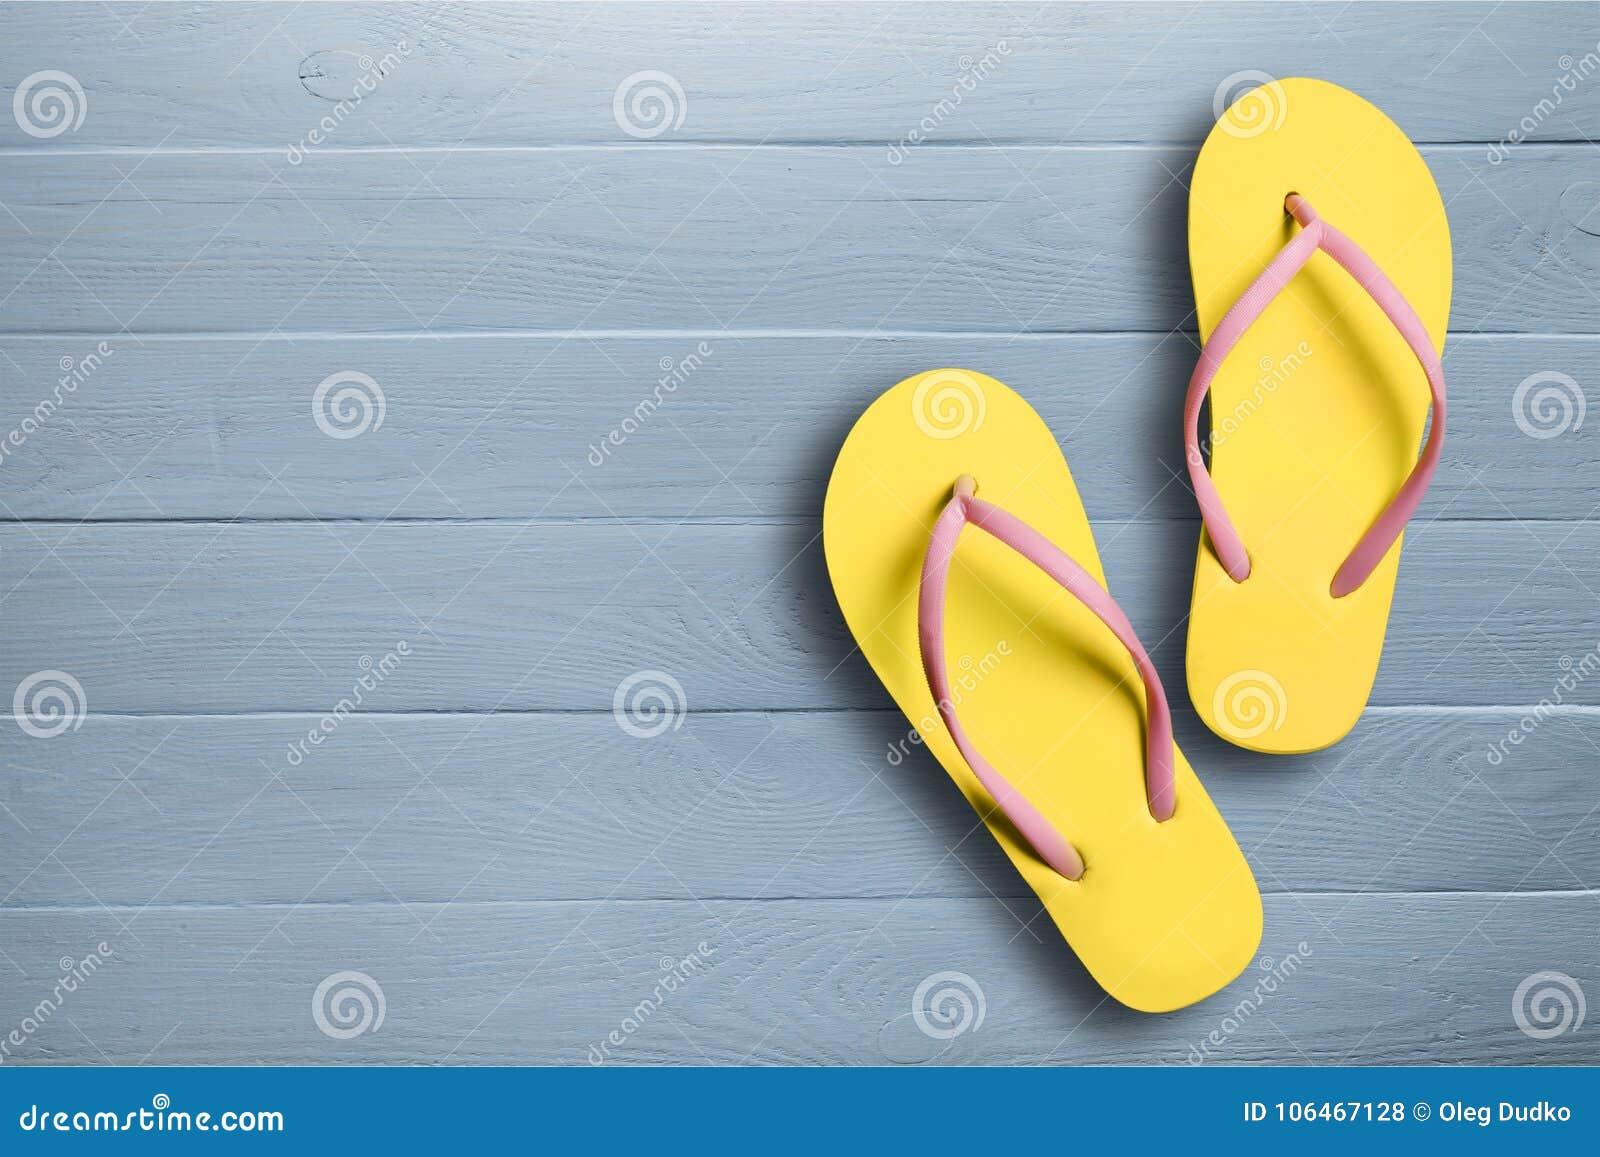 c4913c8ad571 Yellow rubber sandals flip flops on wooden stock photo image jpg 1300x957 Yellow  rubber sandals